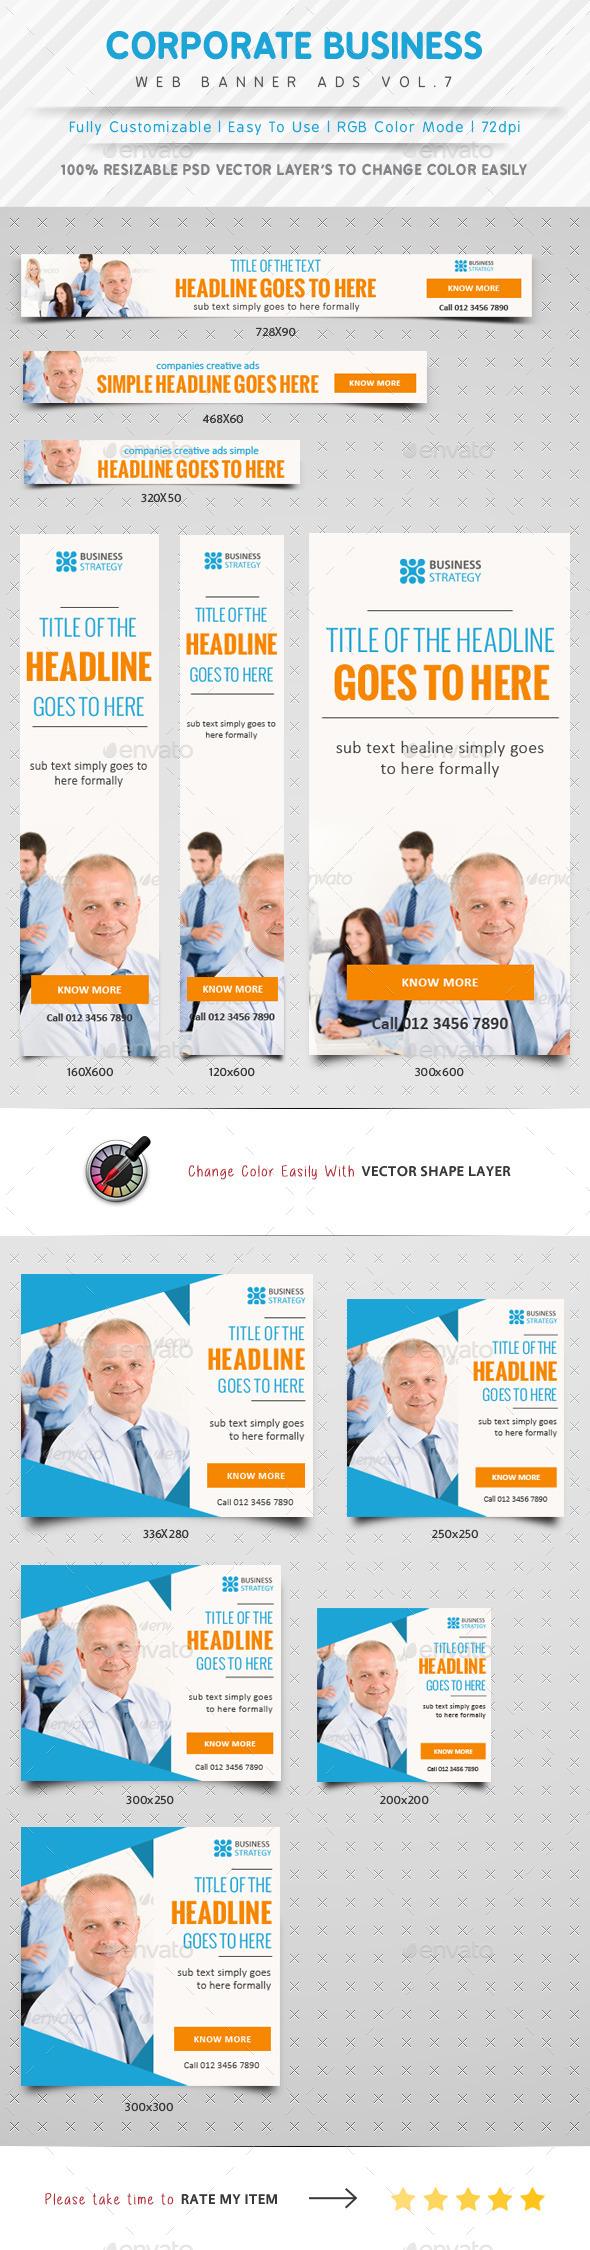 GraphicRiver Corporate Web Banner Ads Vol.7 10020339